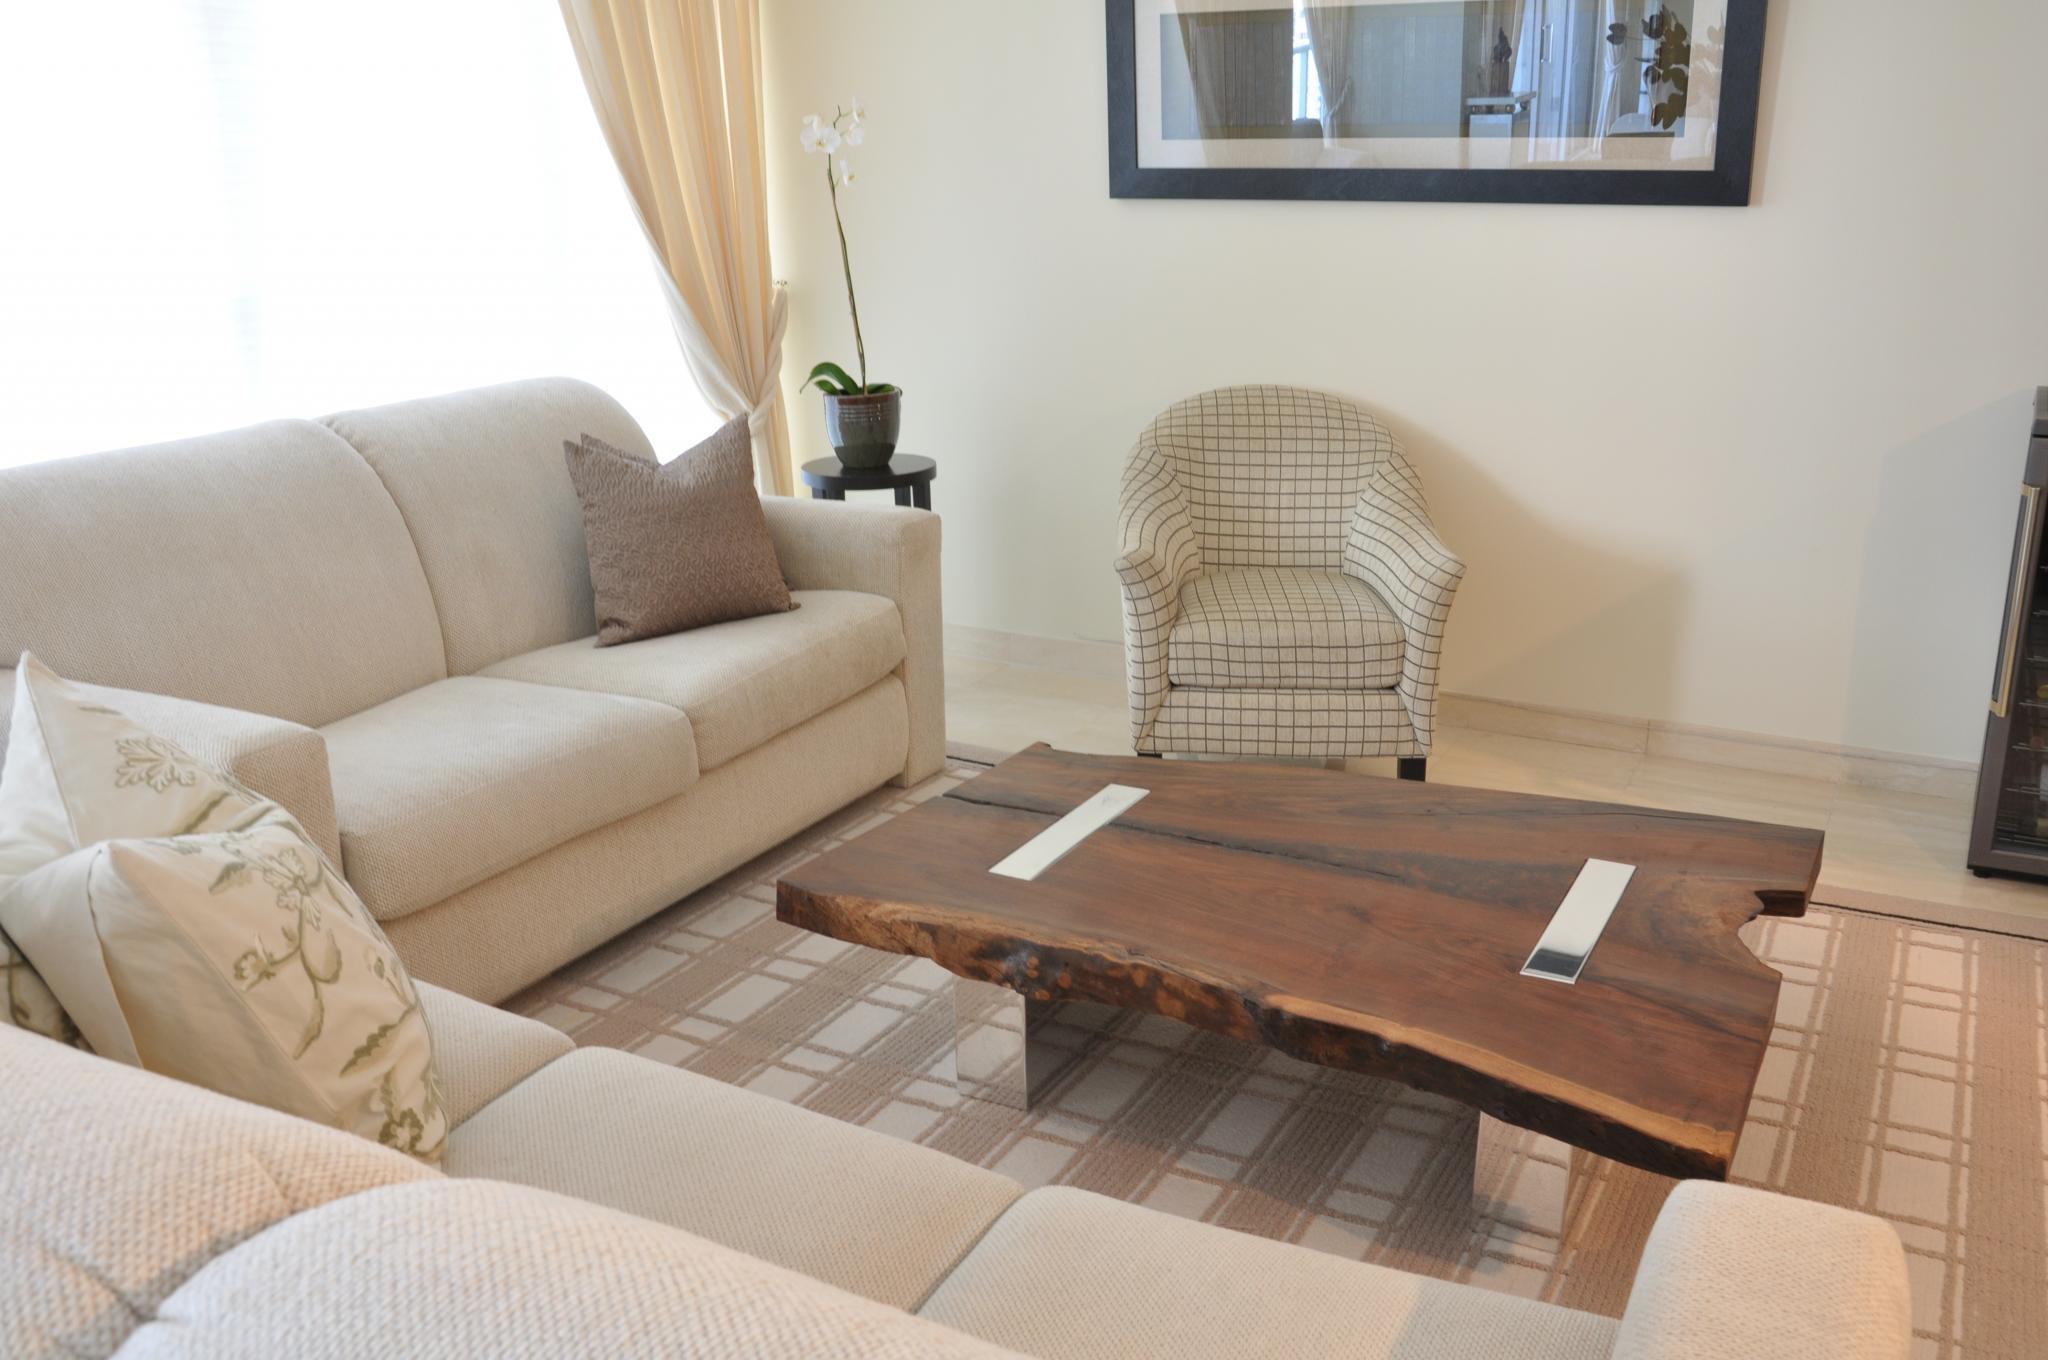 Rotsen-Furniture-Miami-Interior-Design-Walnut Coffee Table - Polished Aluminum Legs 05P(2)